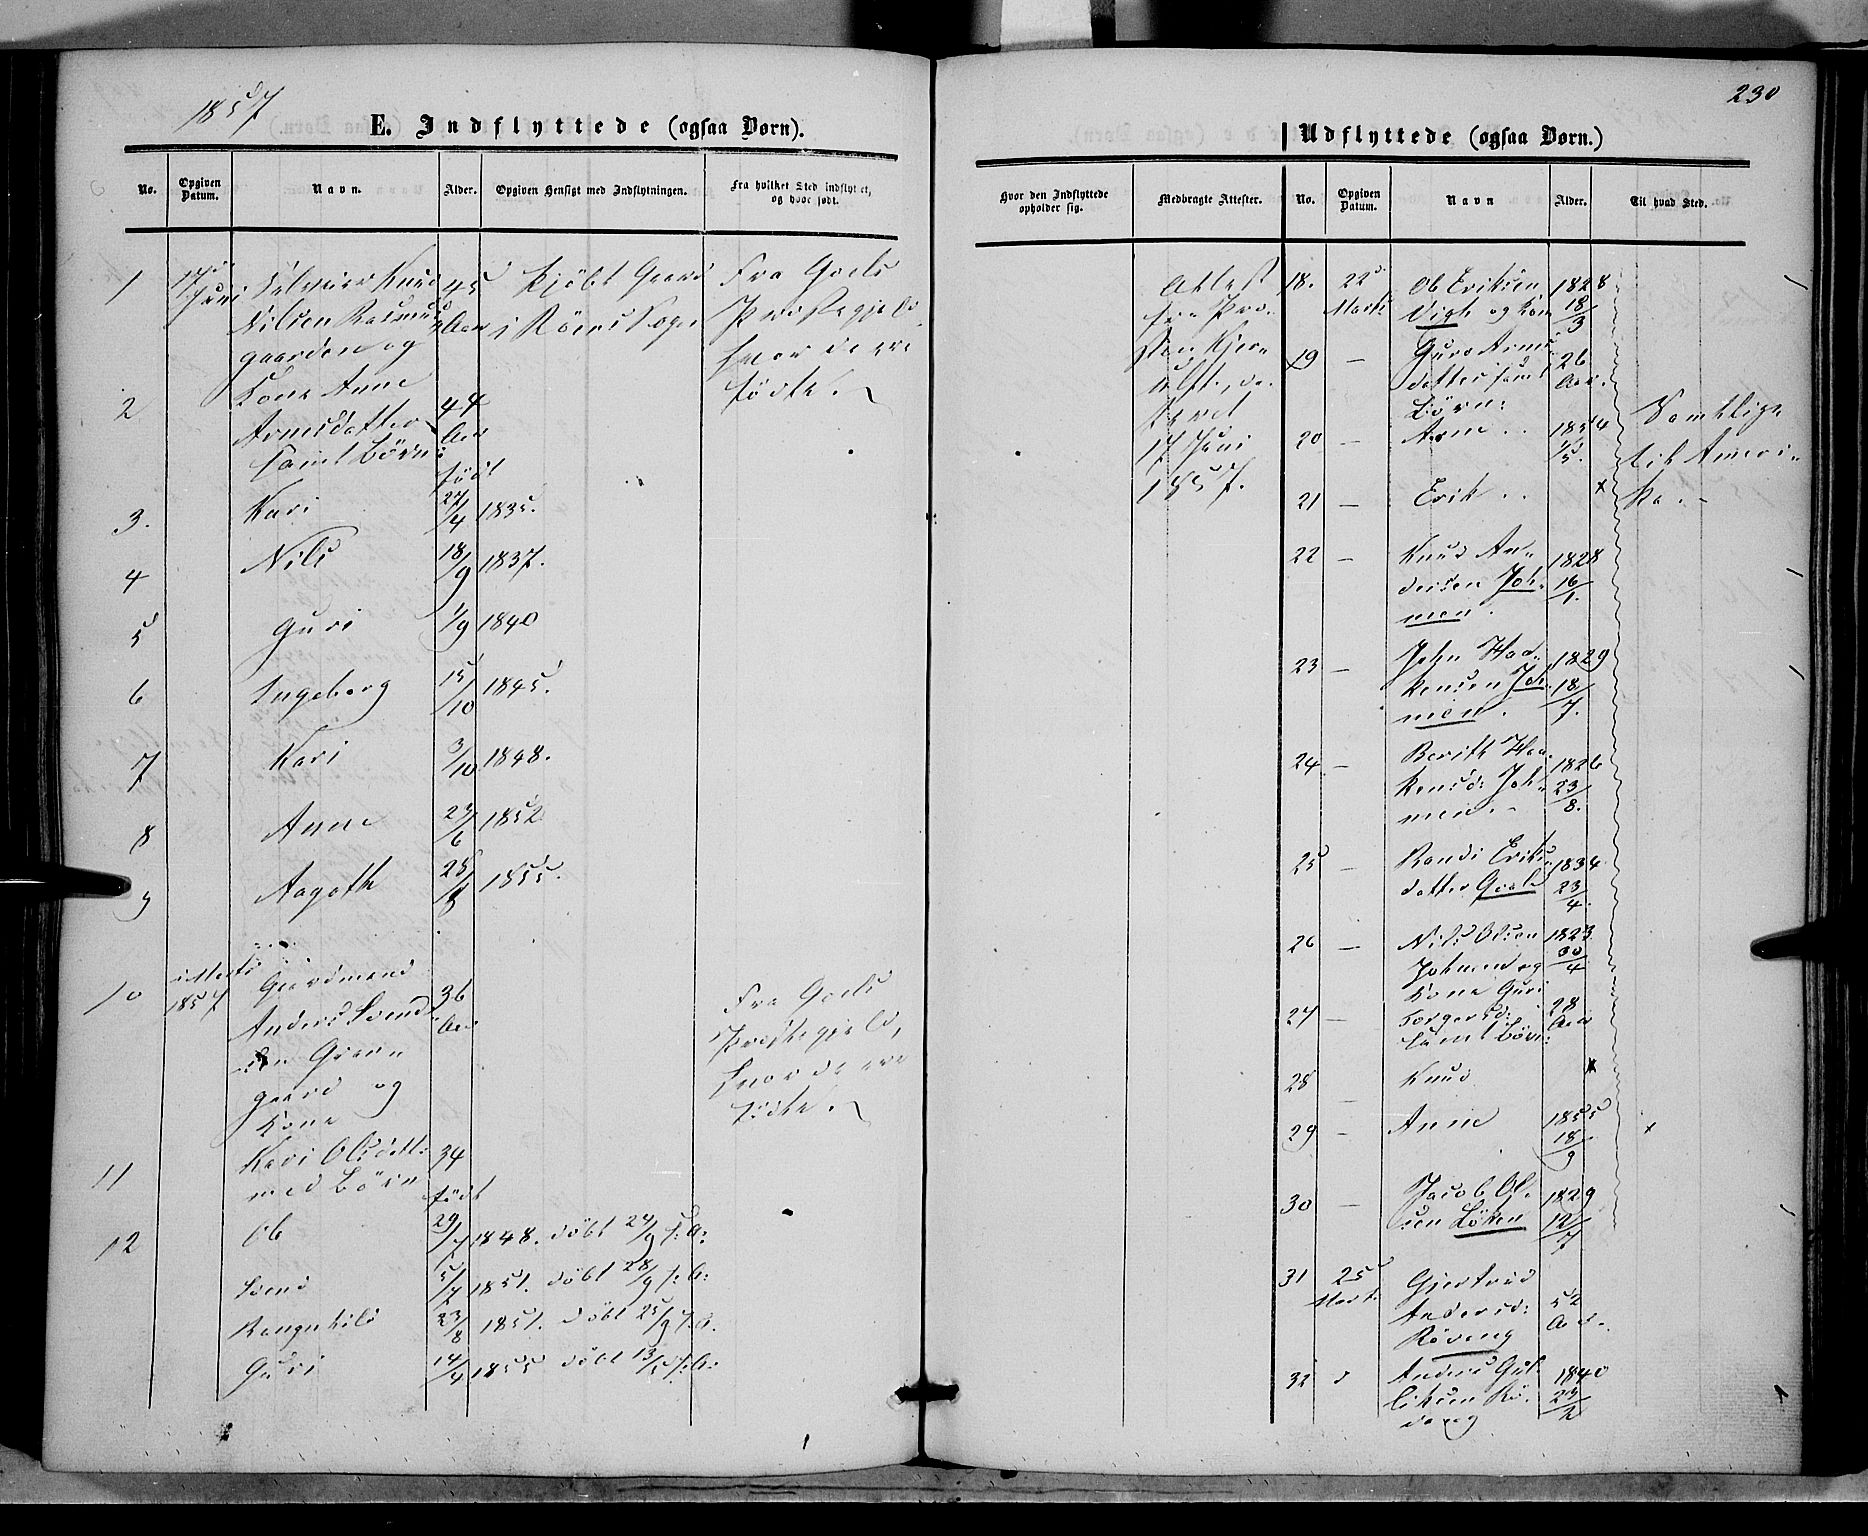 SAH, Vestre Slidre prestekontor, Ministerialbok nr. 2, 1856-1864, s. 230